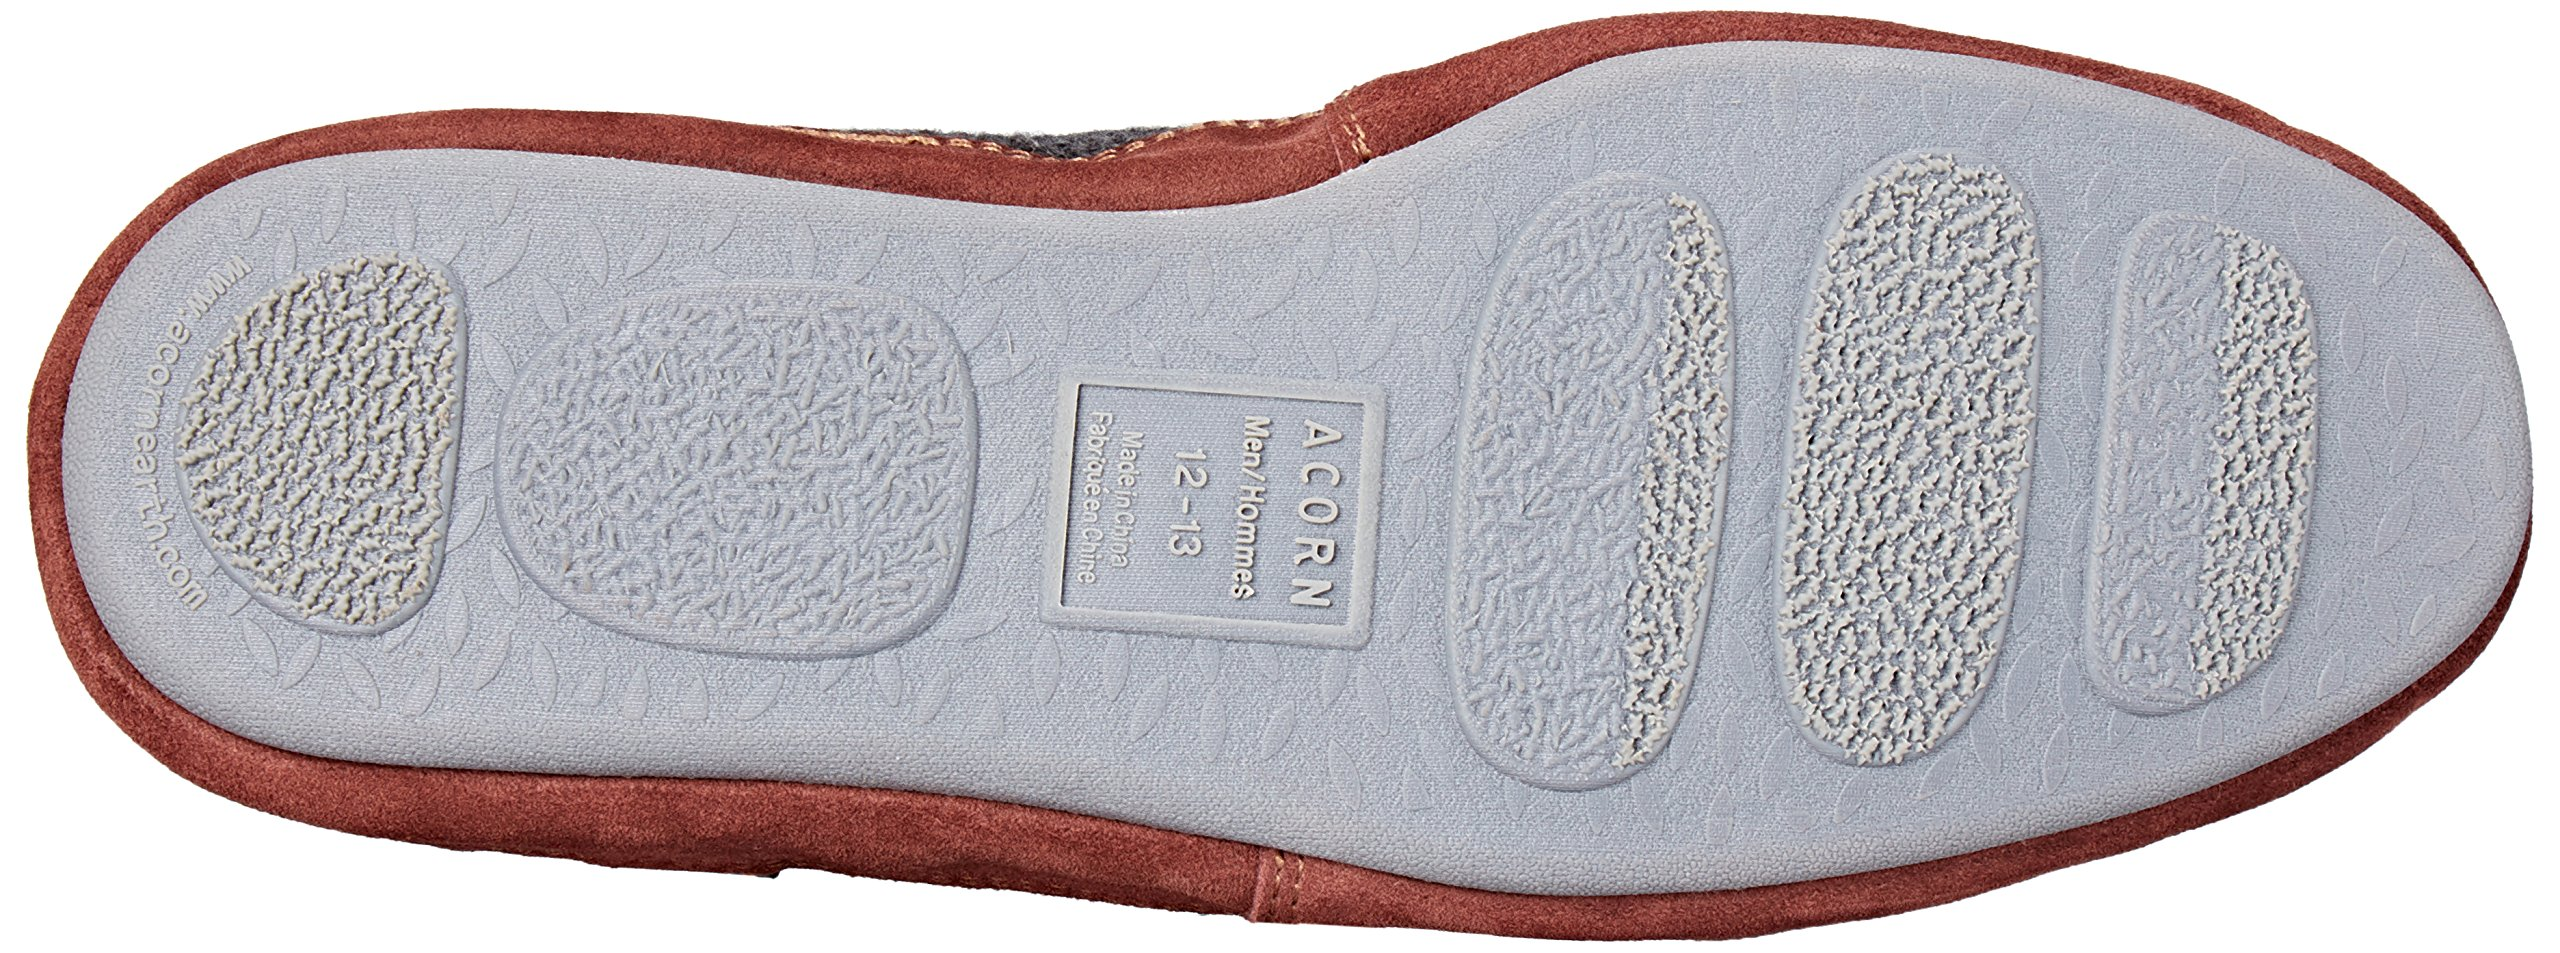 Acorn Men's Slouch Boot Slipper, Charcoal Ragg Wool, Medium/9-10 B US by Acorn (Image #3)